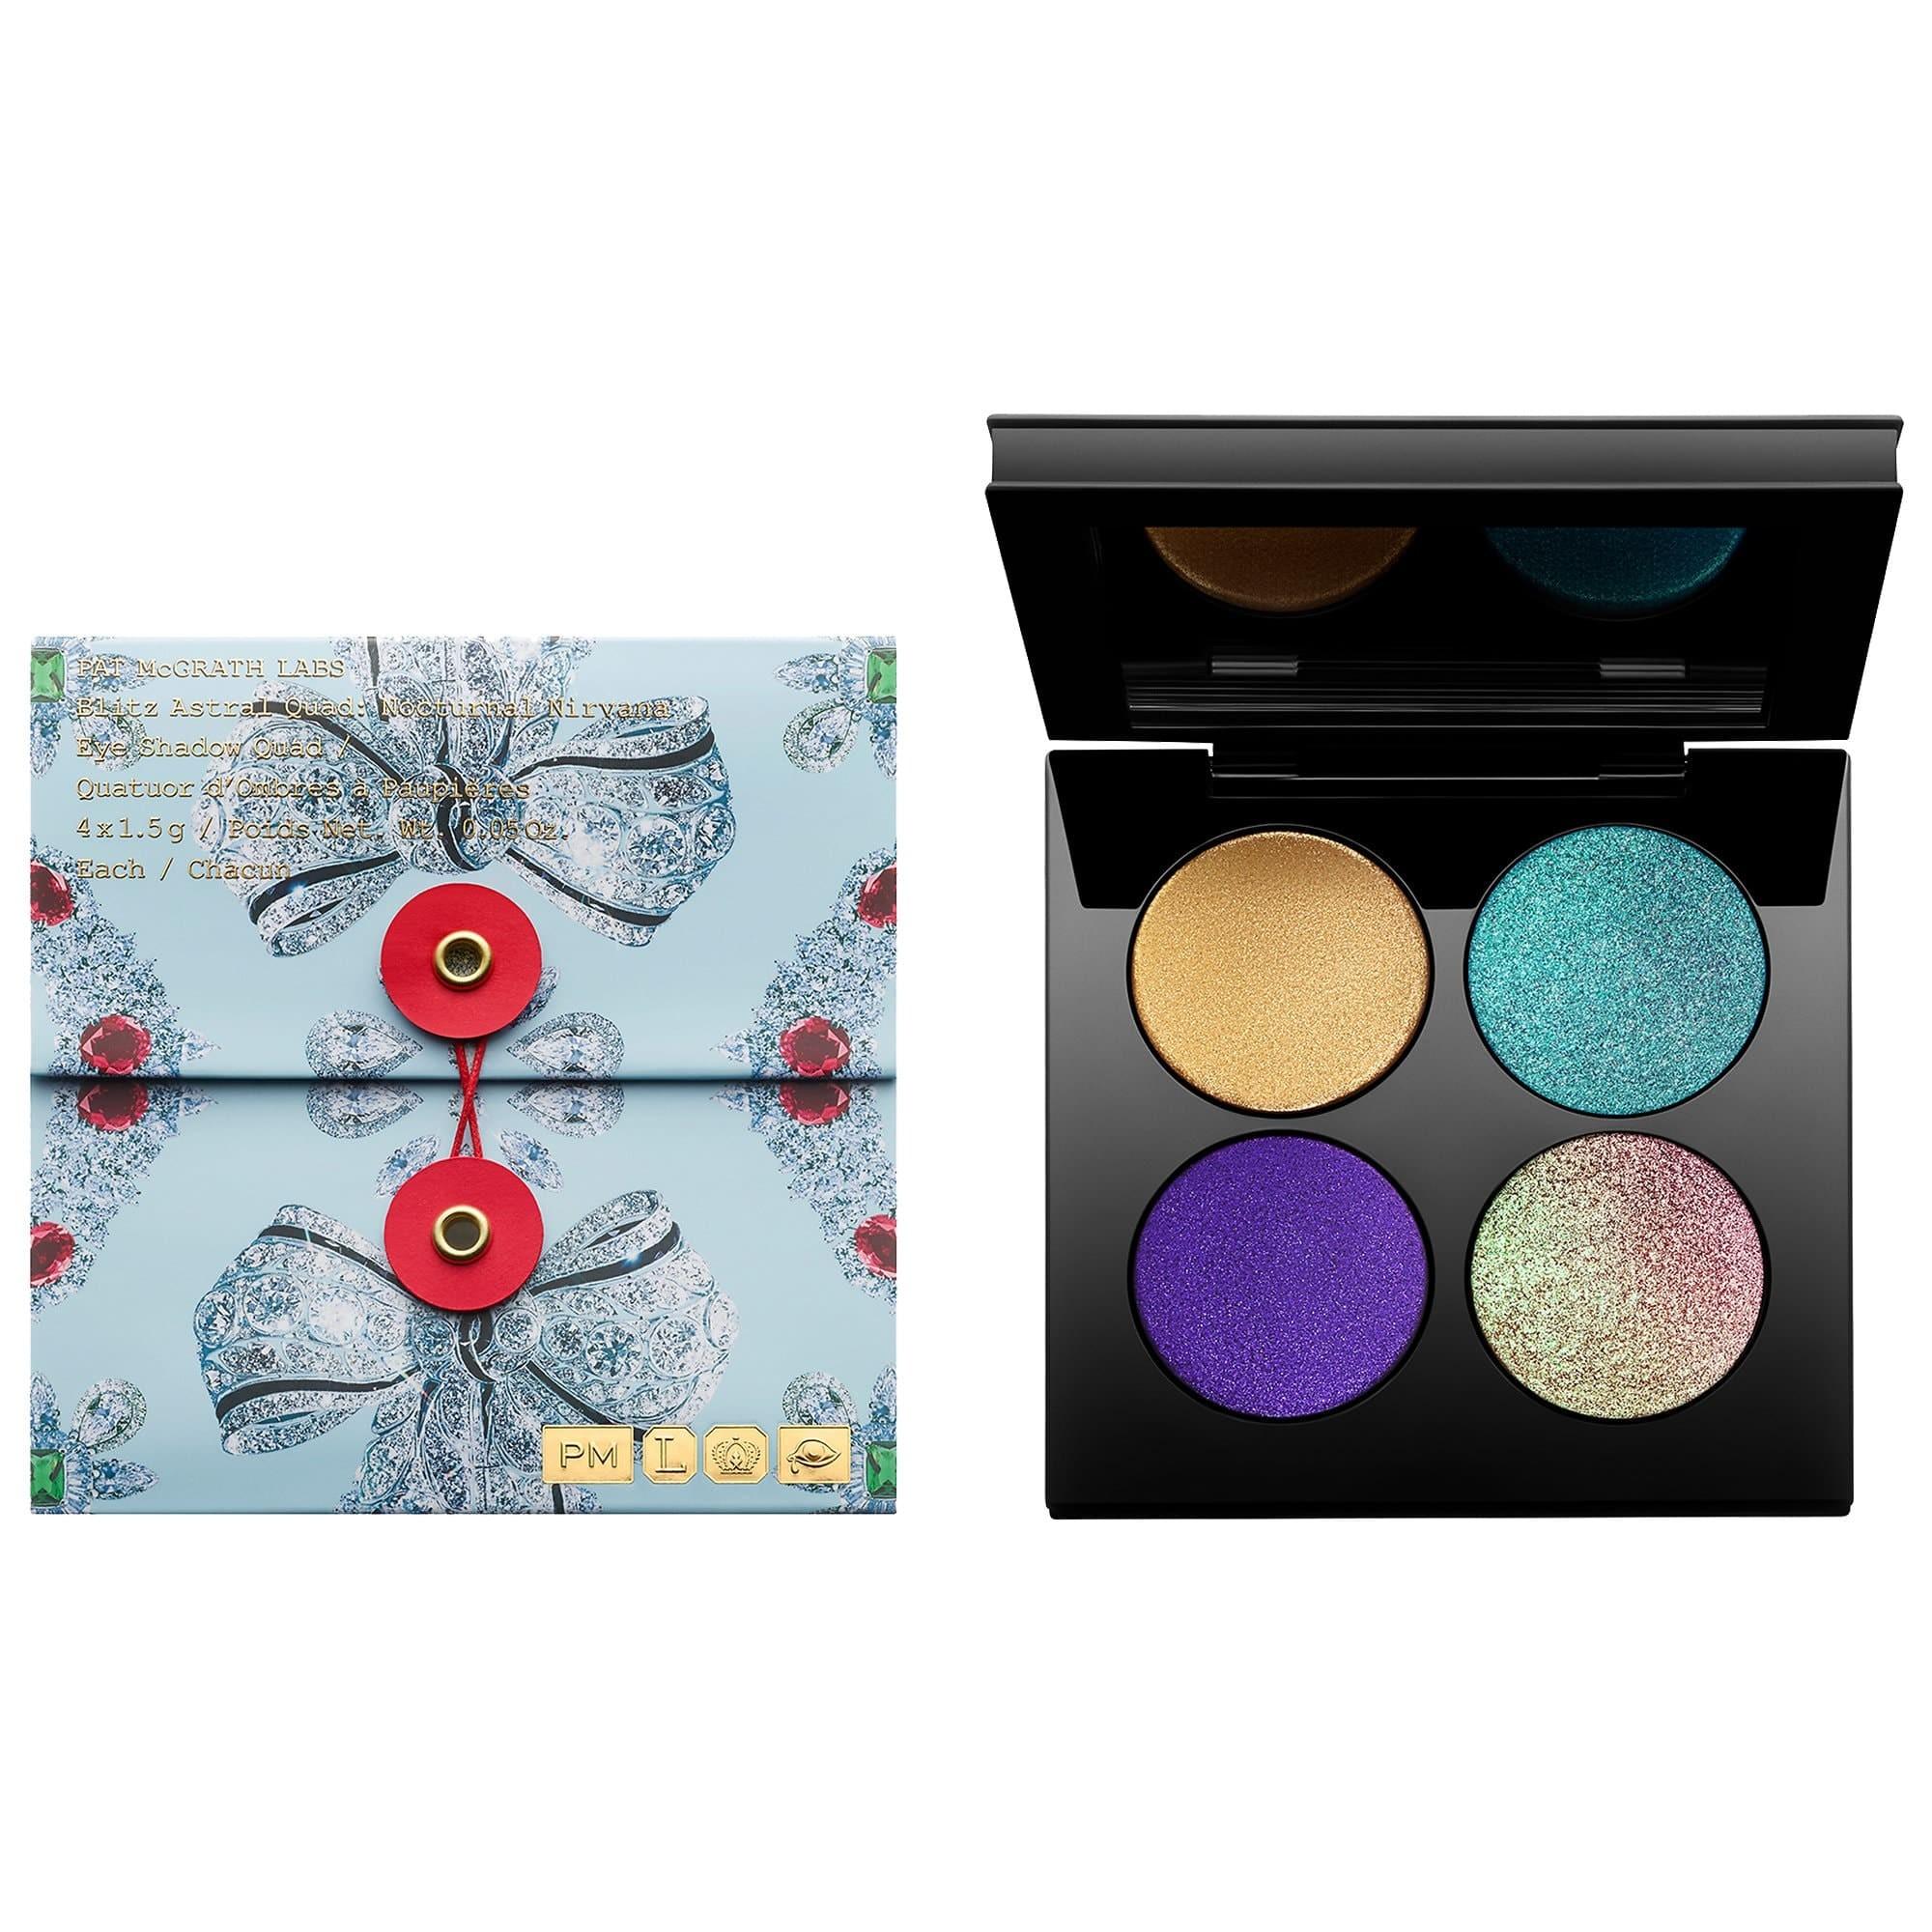 Pat McGrath Labs Blitz Astral Quad Eyeshadow Palette Nocturnal Nirvana